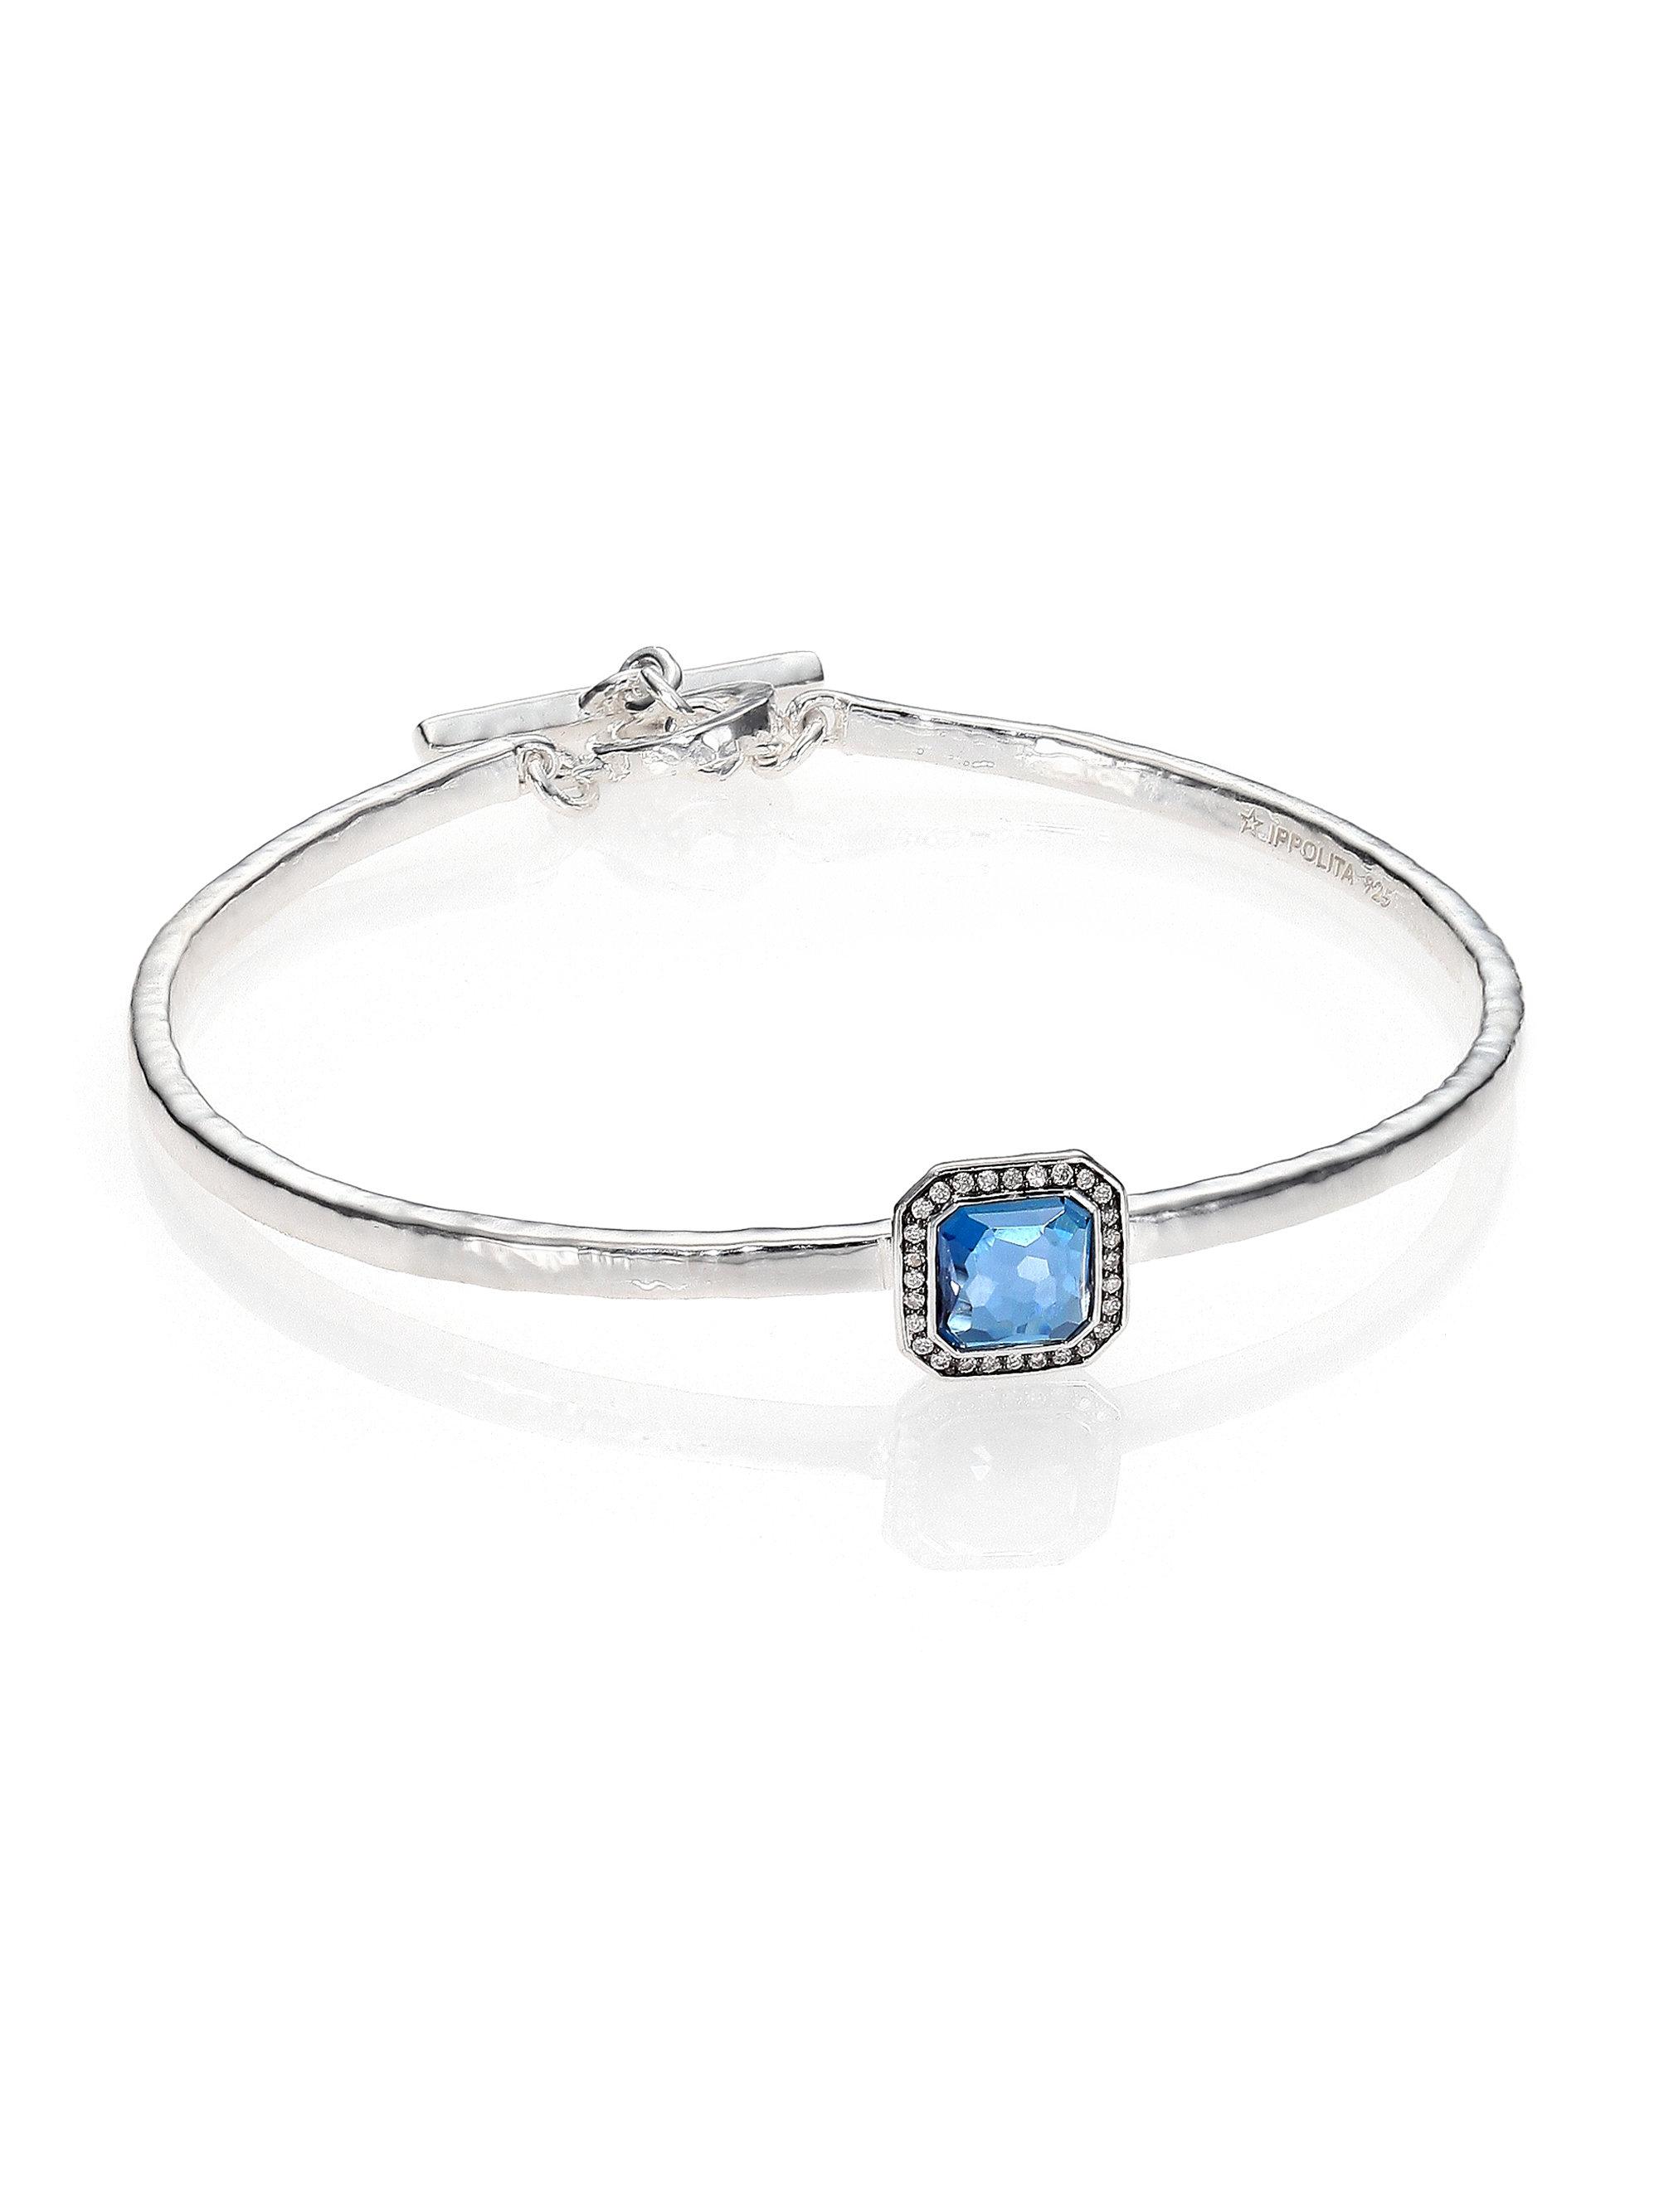 Ippolita Stella Sterling Silver Bangle in Blue Topaz with Diamonds s7zaeG3